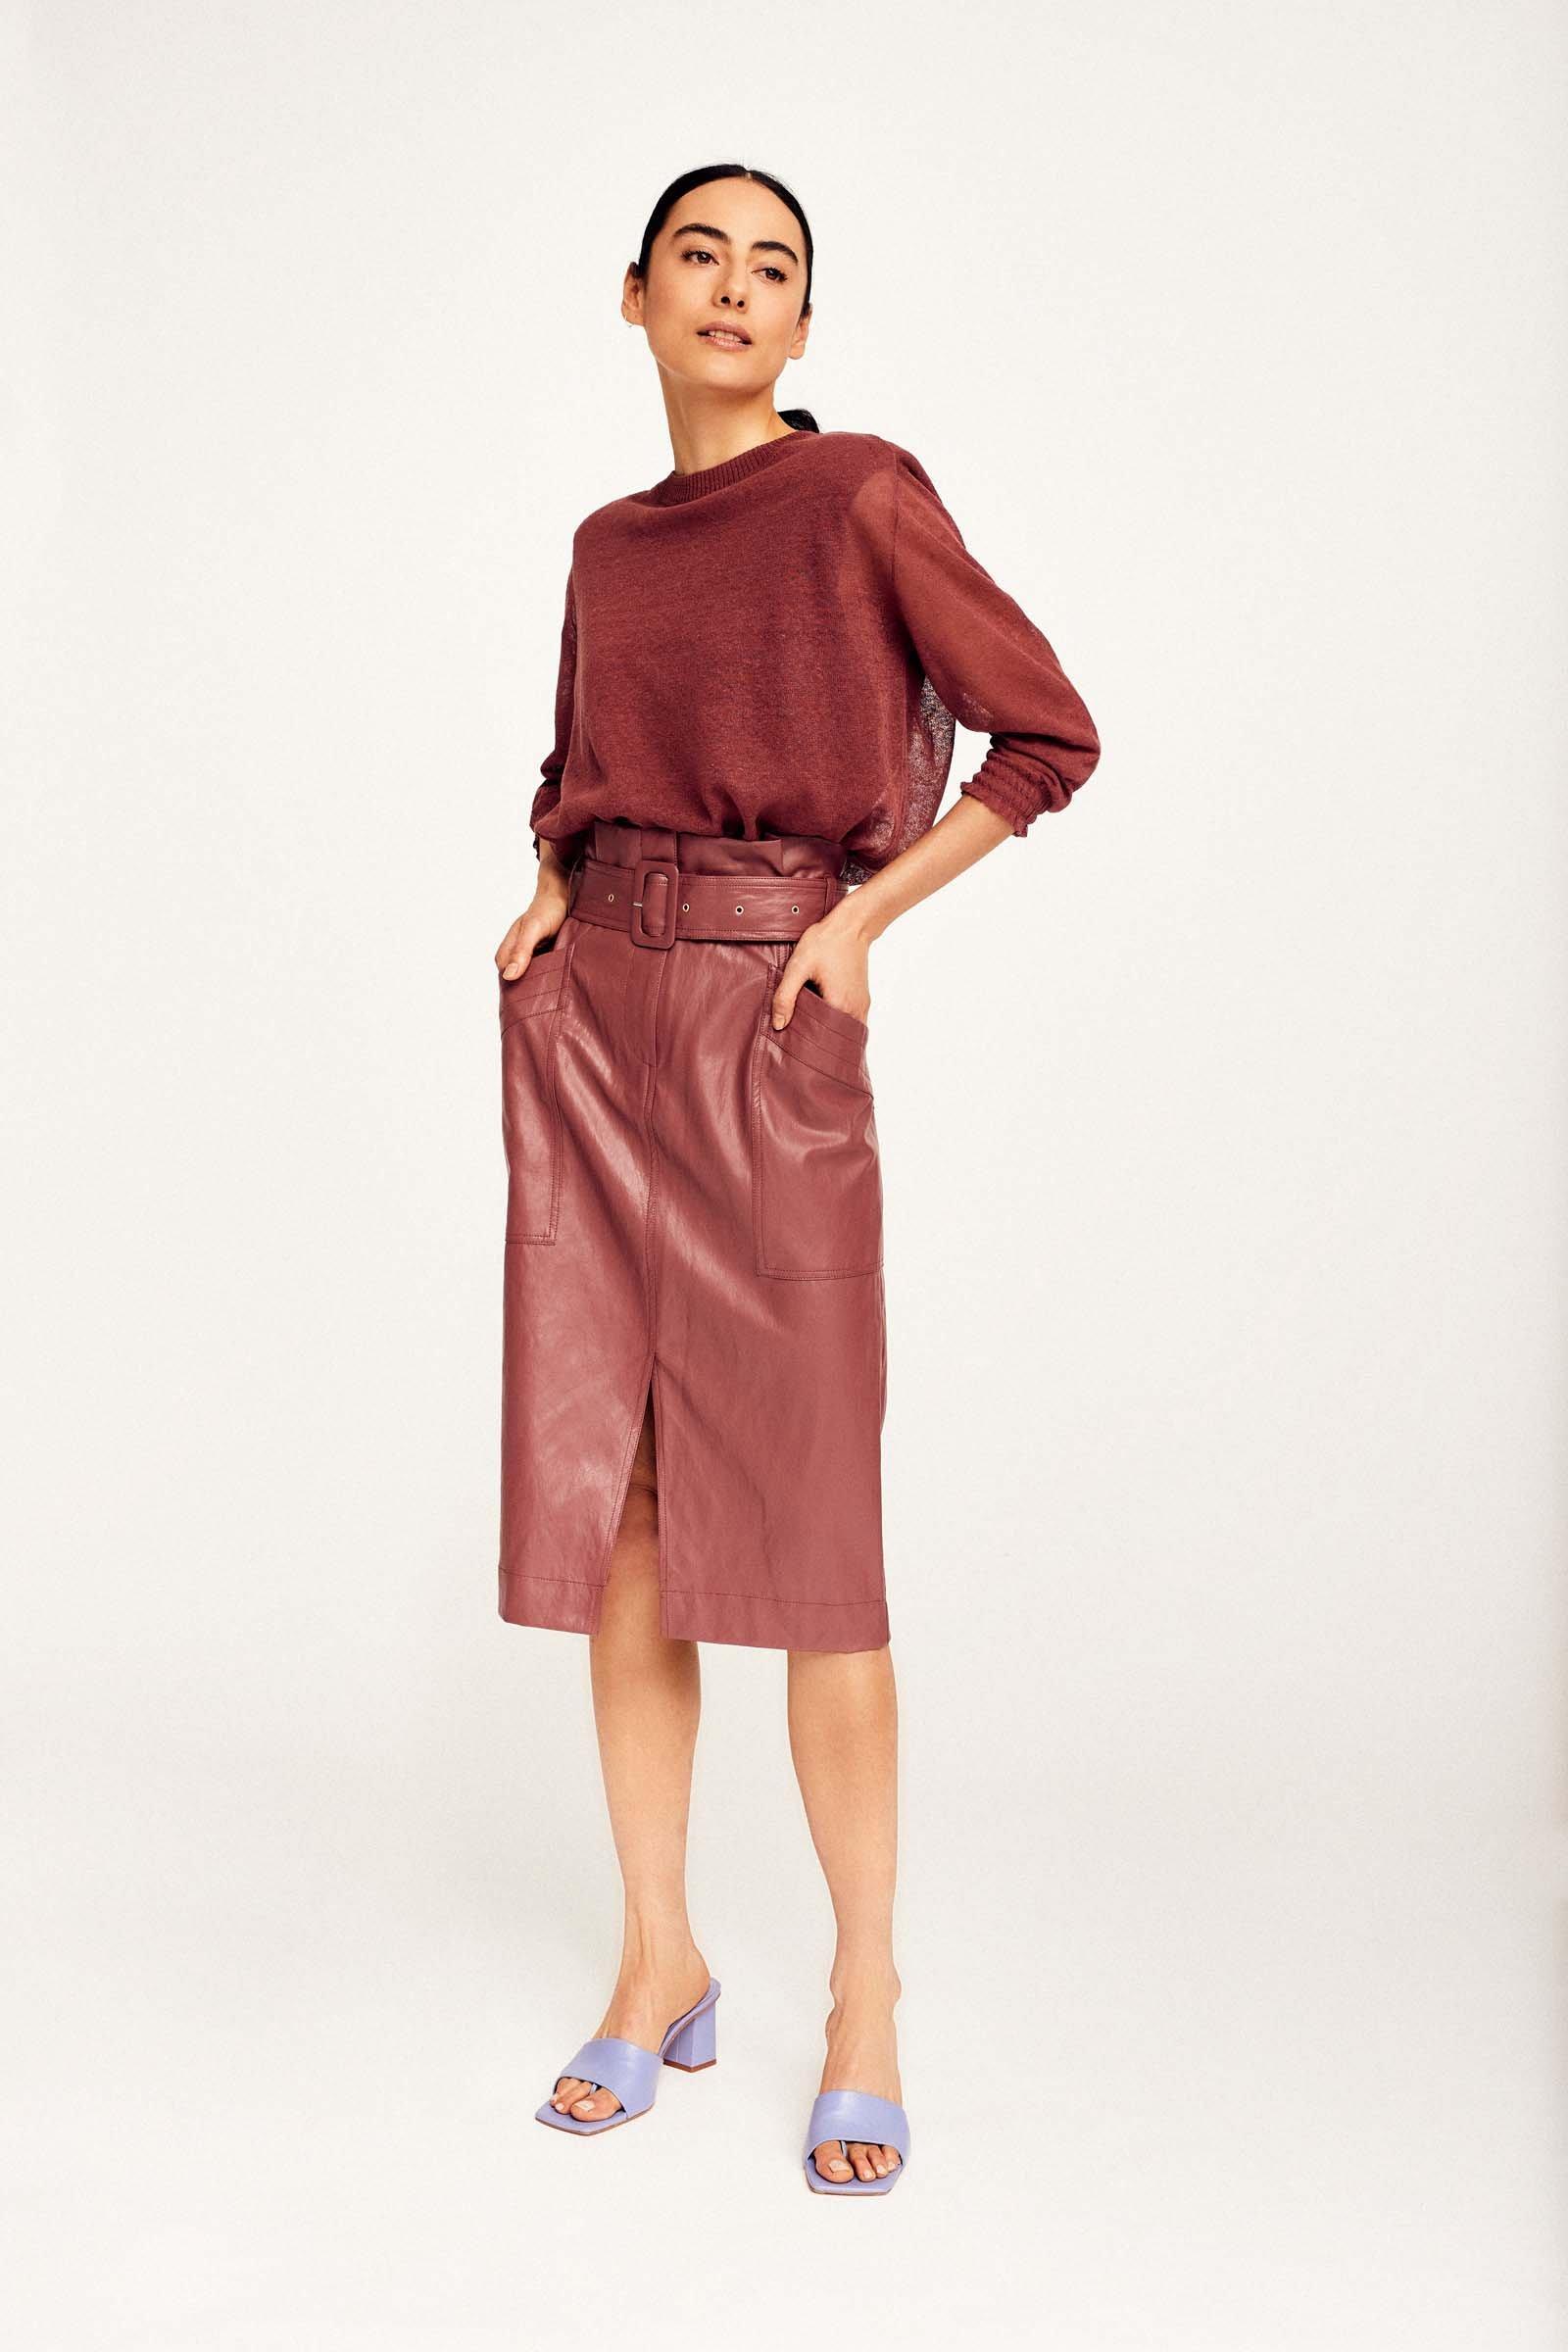 https://webmedia.cks-fashion.com/i/cks/123297ASM_30_f_model